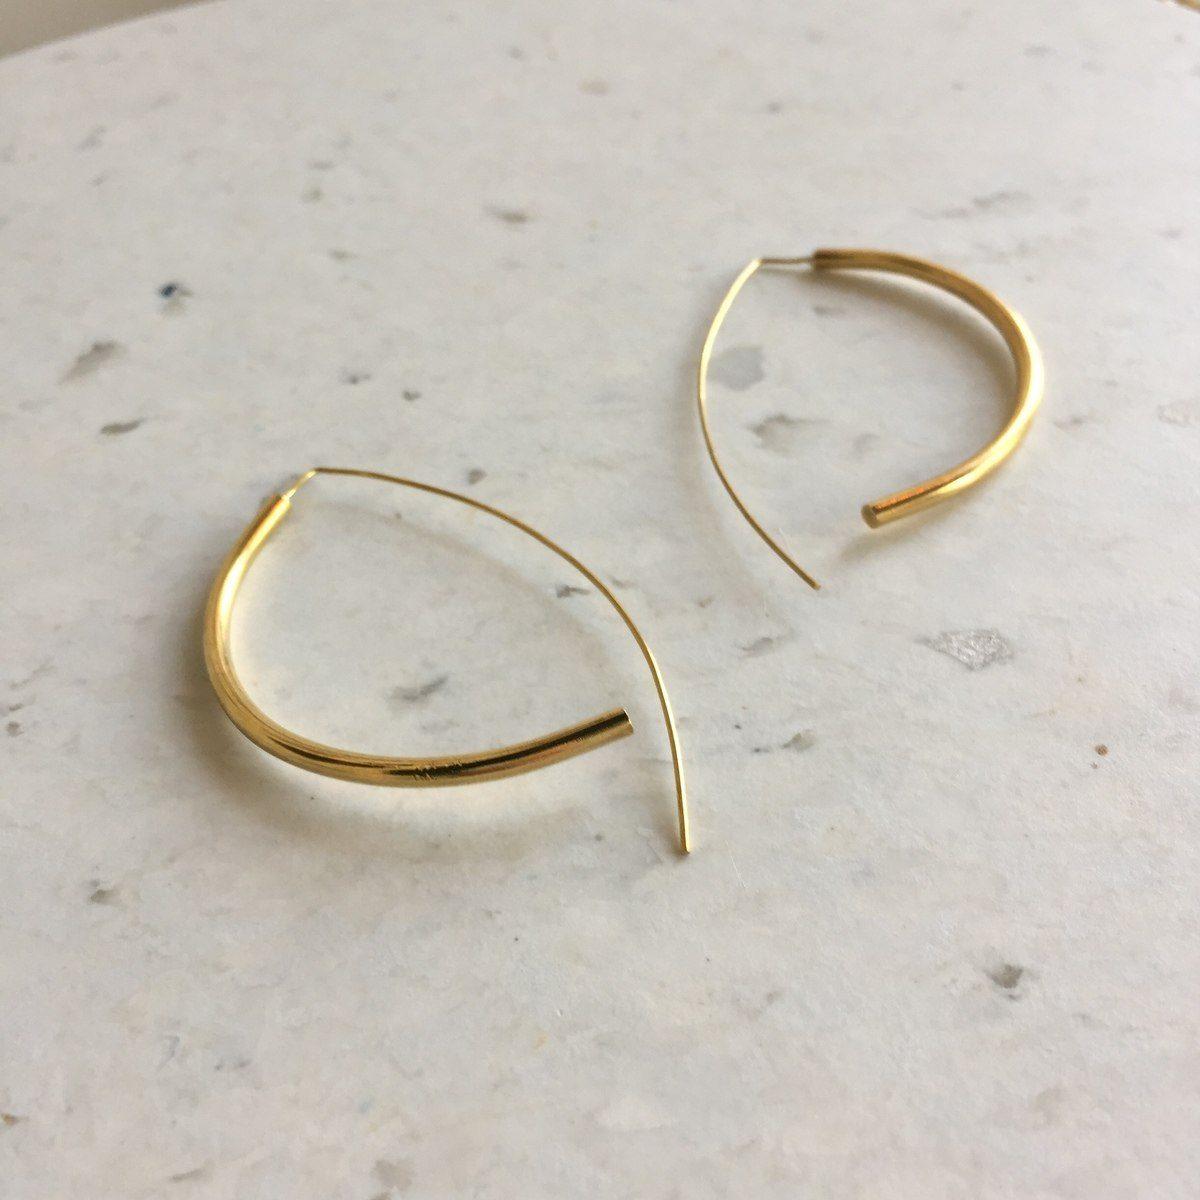 Handmade Brass Earrings